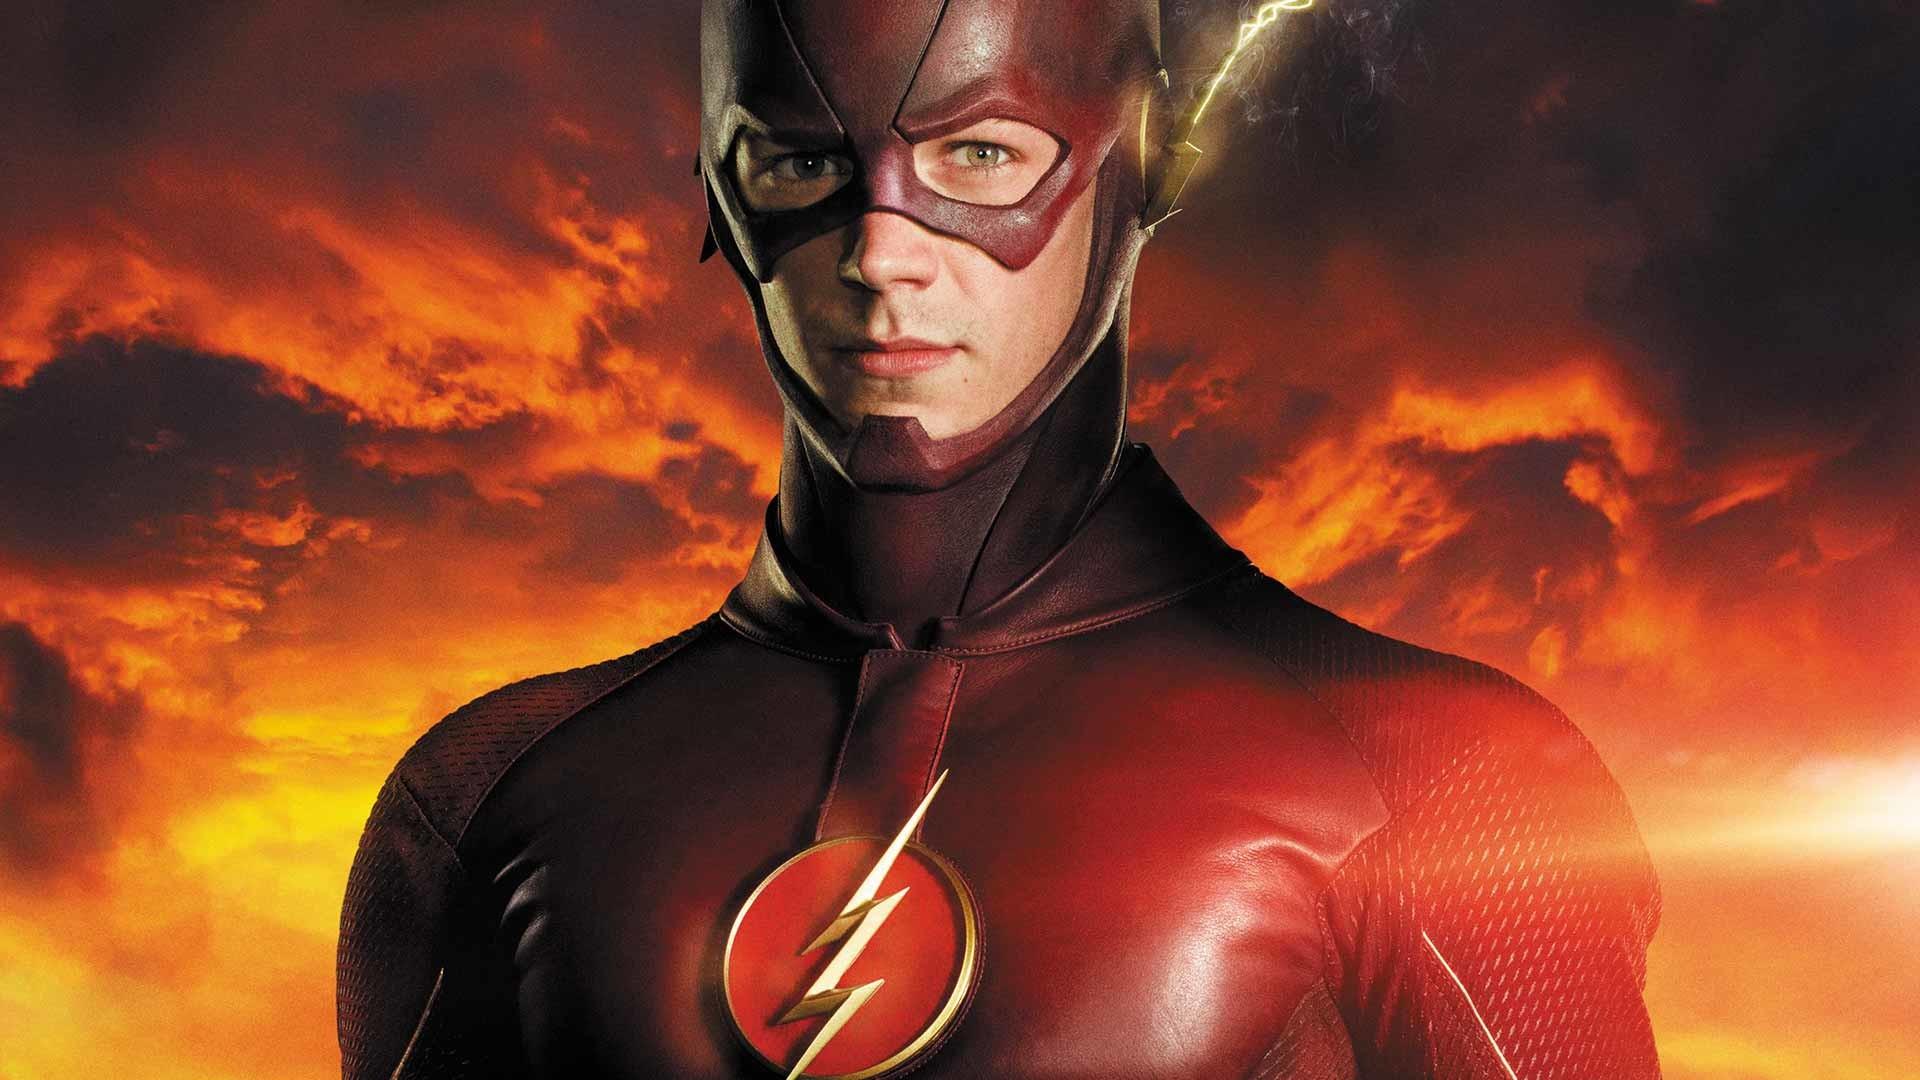 Syfy -The Flash Season 4 premiere title may hint at comic-influenced story    The Flash Season 4 premiere title may hint at comic-influenced story